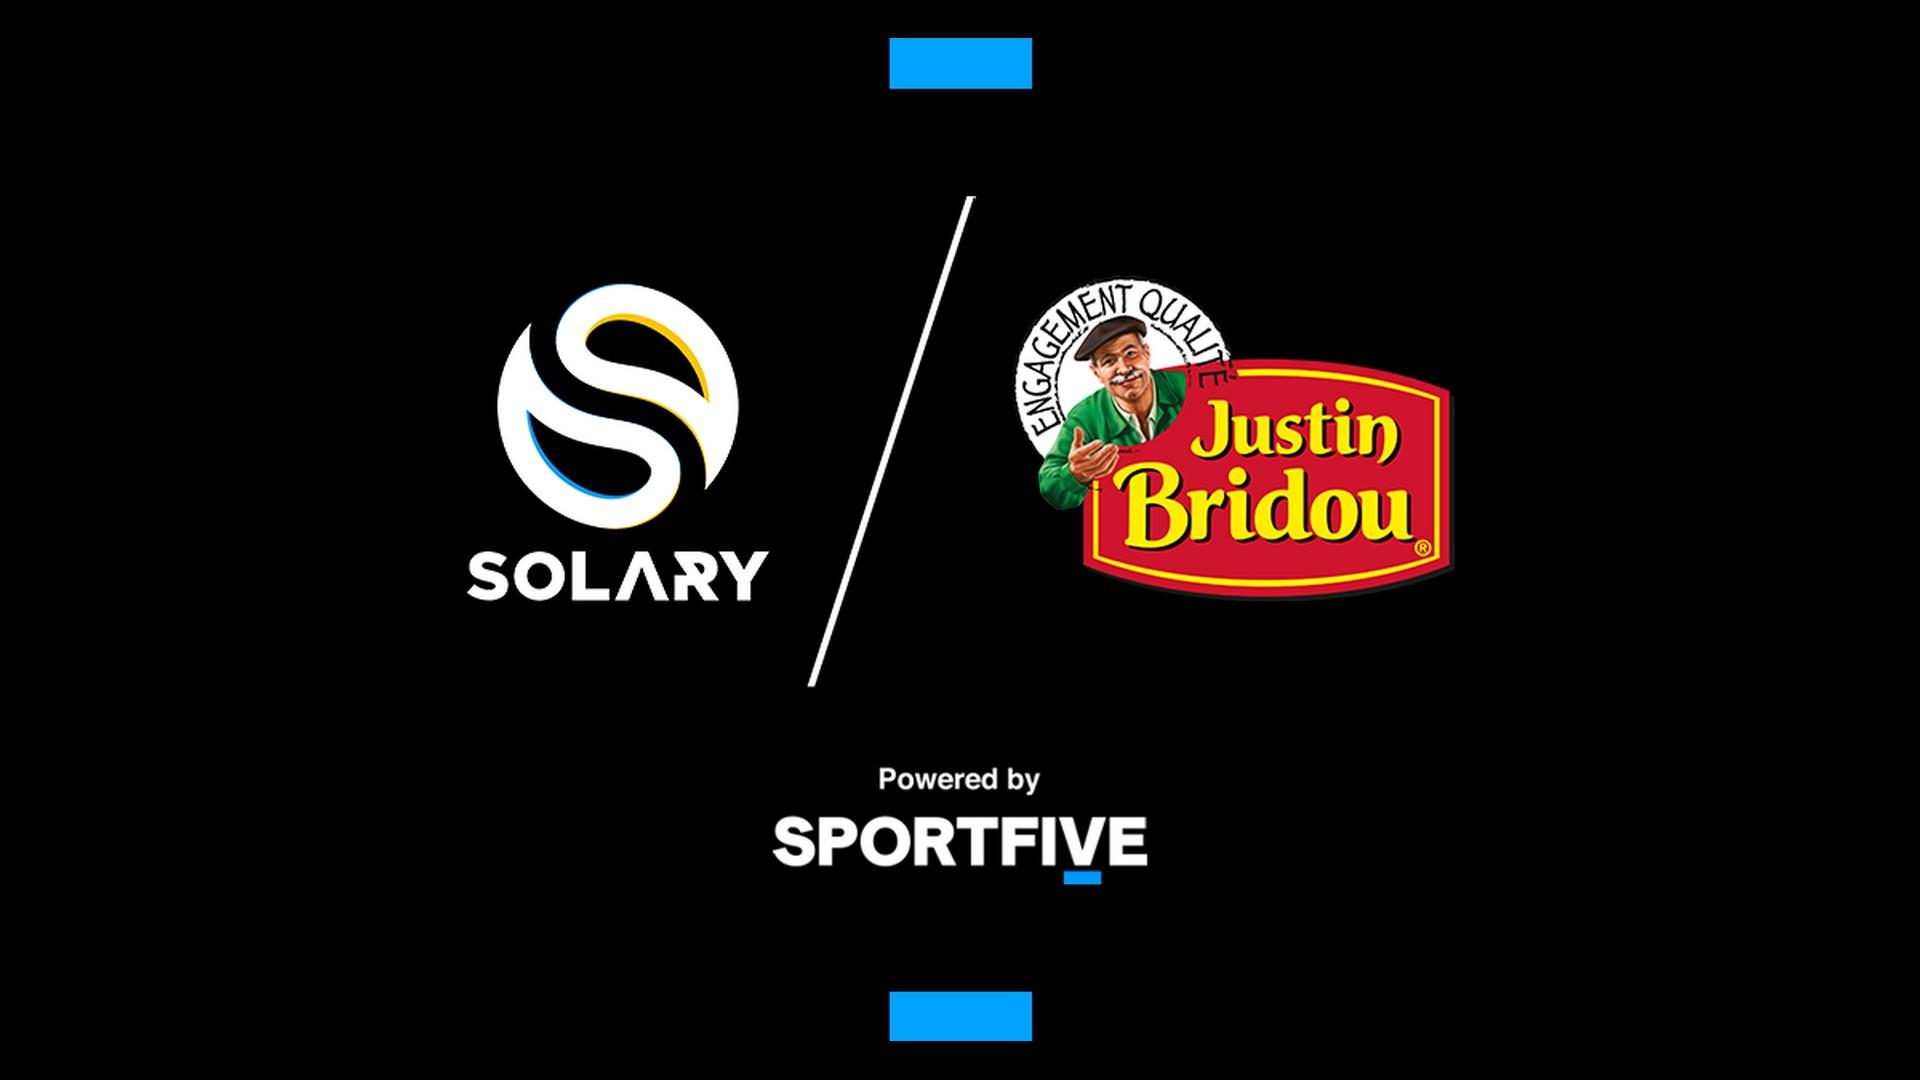 Justin Bridou x Solary (esport) 2020